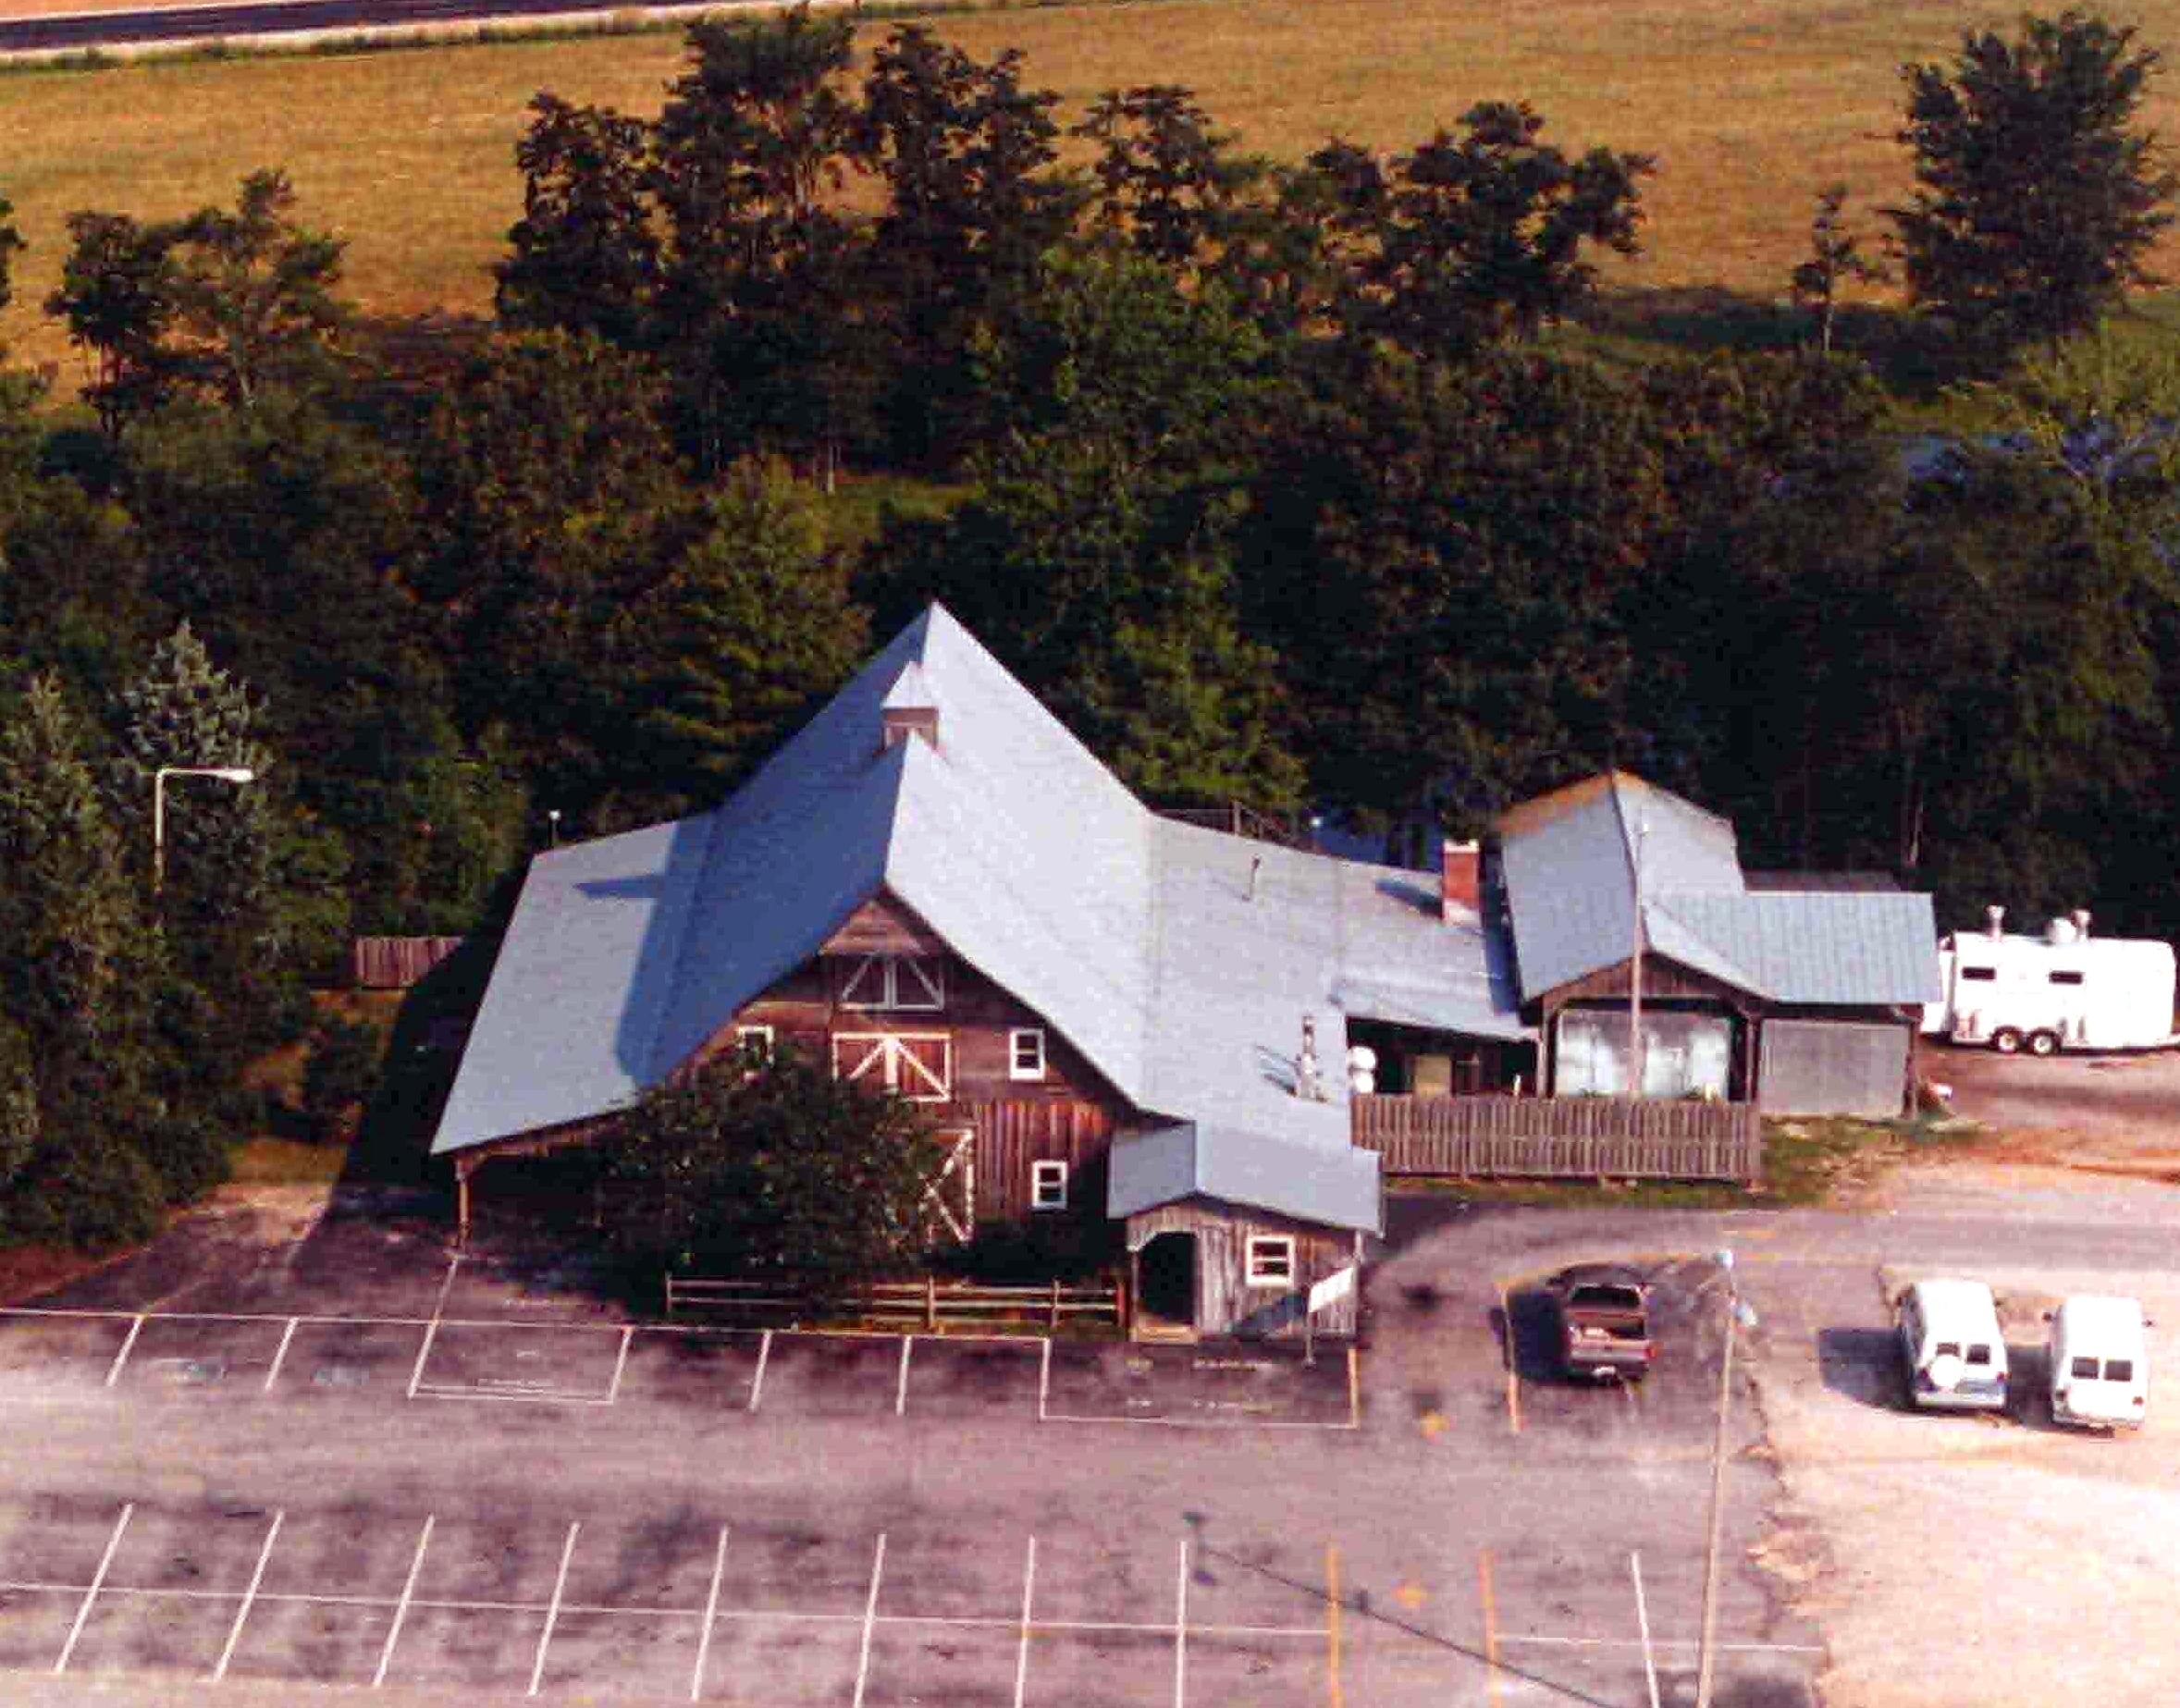 Brooksie's Barn